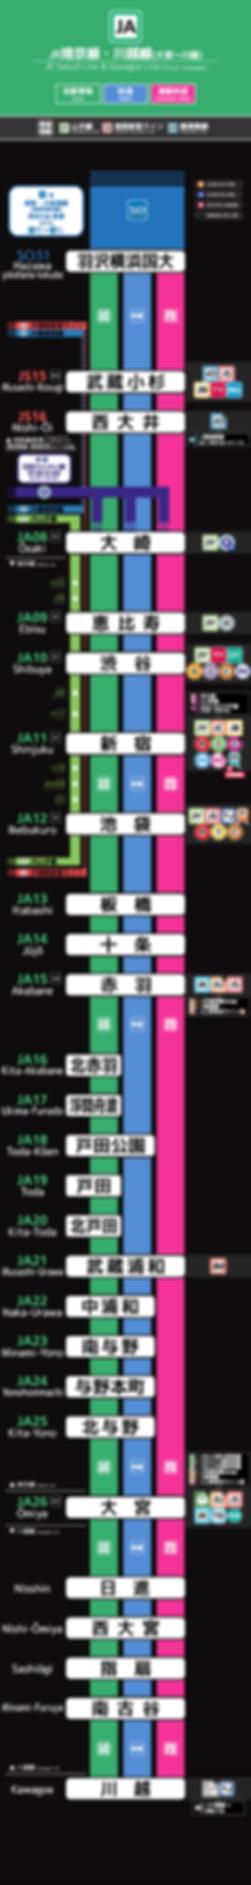 JR埼京線路線図